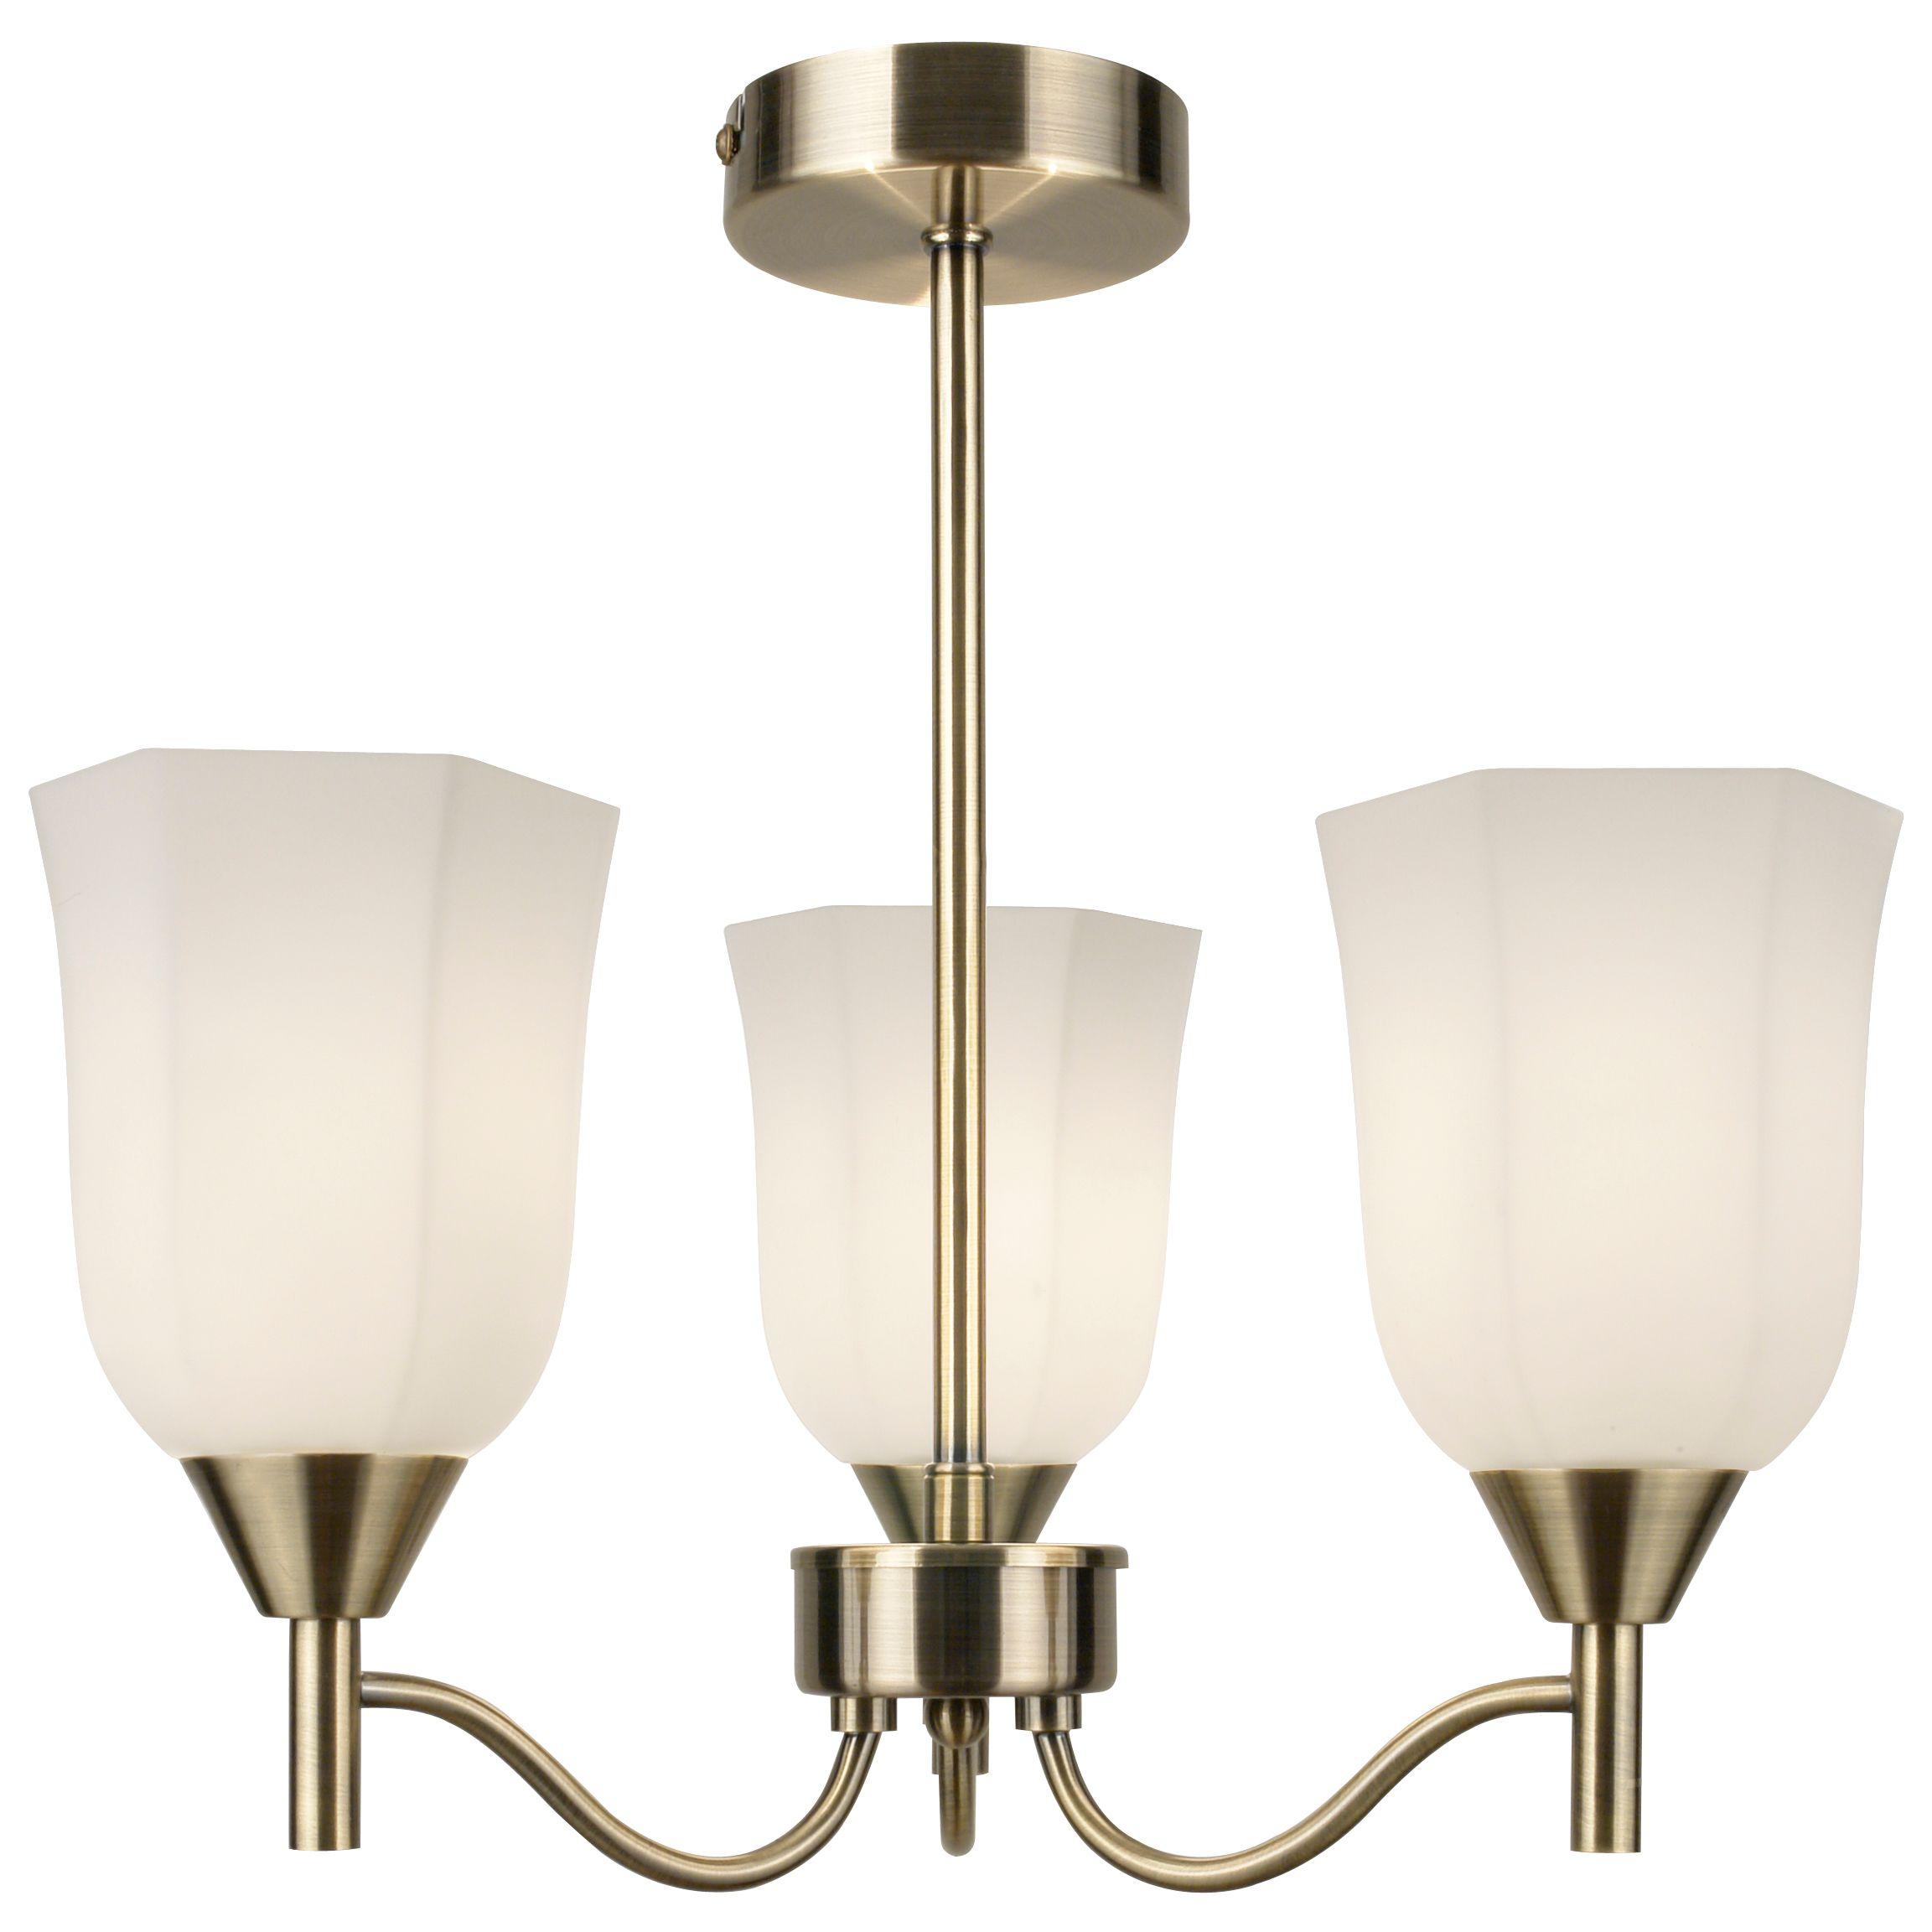 John Lewis Ceiling Lights Antique Brass : John lewis tilda ceiling light arm antique review